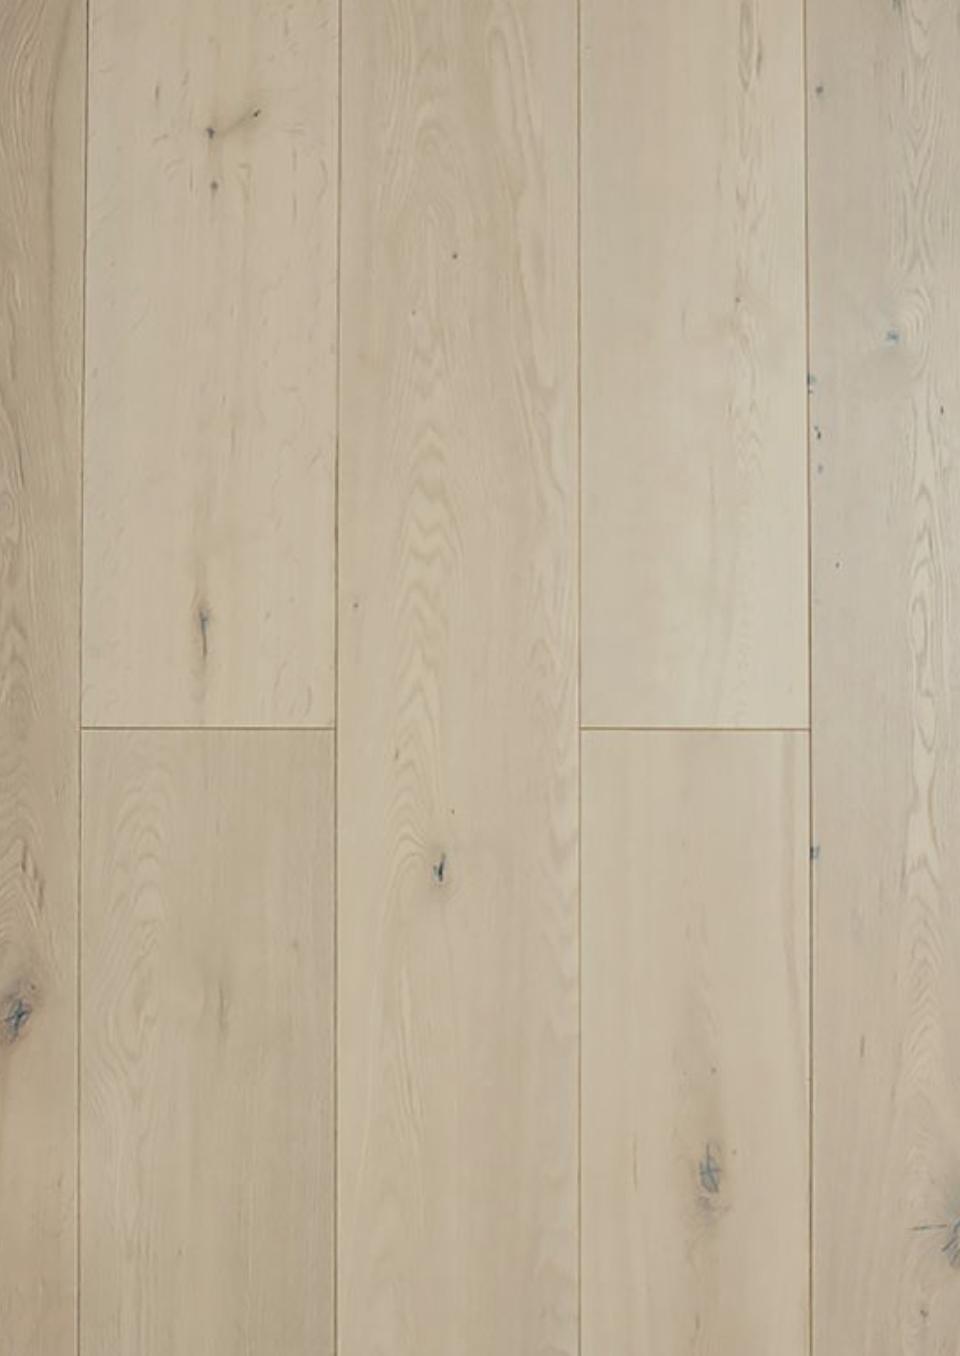 Our Flooring Choice Flooring Classic Wood Floors Direct Wood Flooring